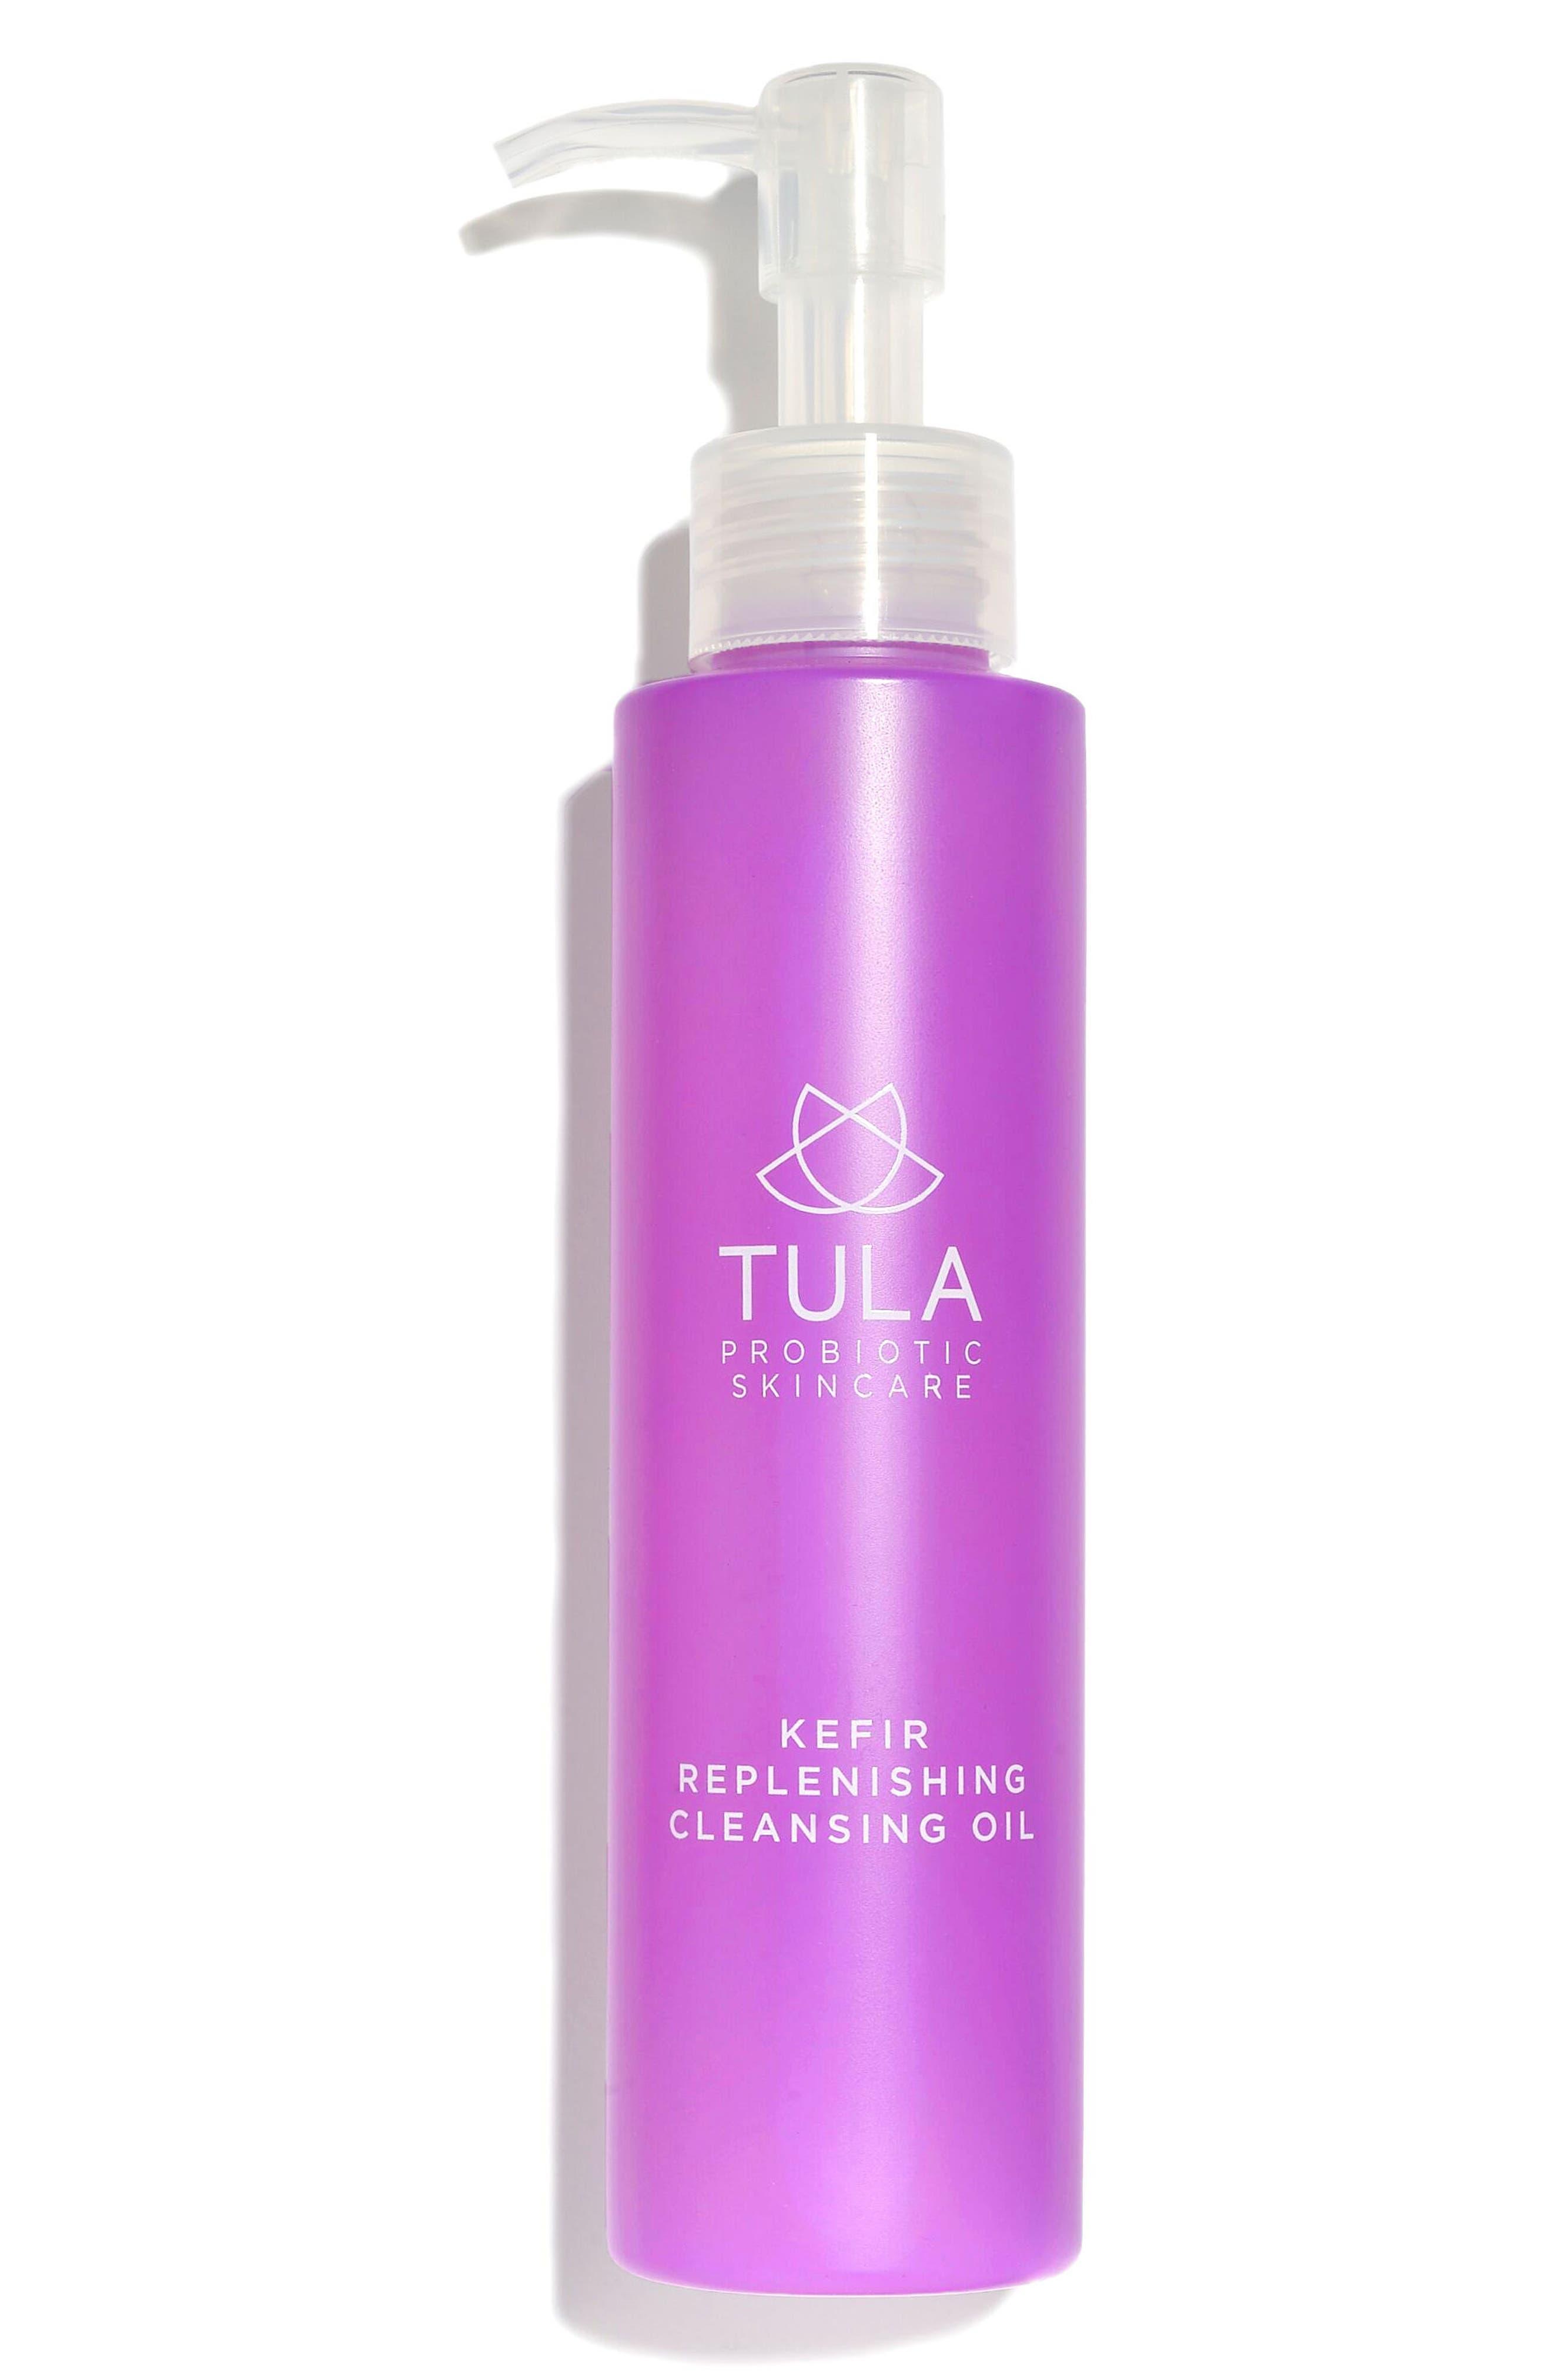 Tula Probiotic Skincare Kefir Replenishing Cleansing Oil